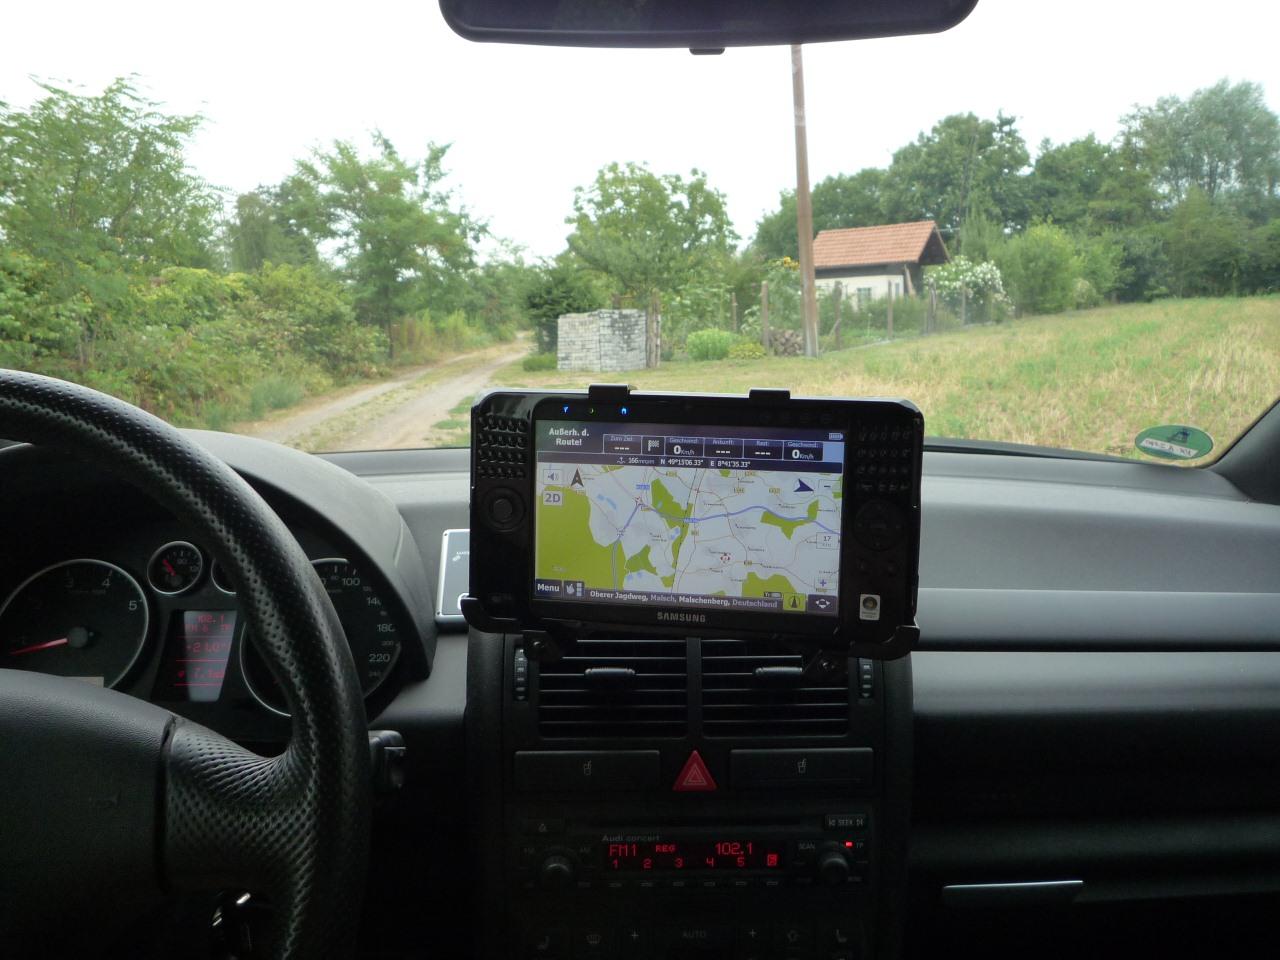 CAR-UMPC-Projekt_Position_Final2.JPG.37da2f529a56f03e46ddfa46e2c761a0.JPG